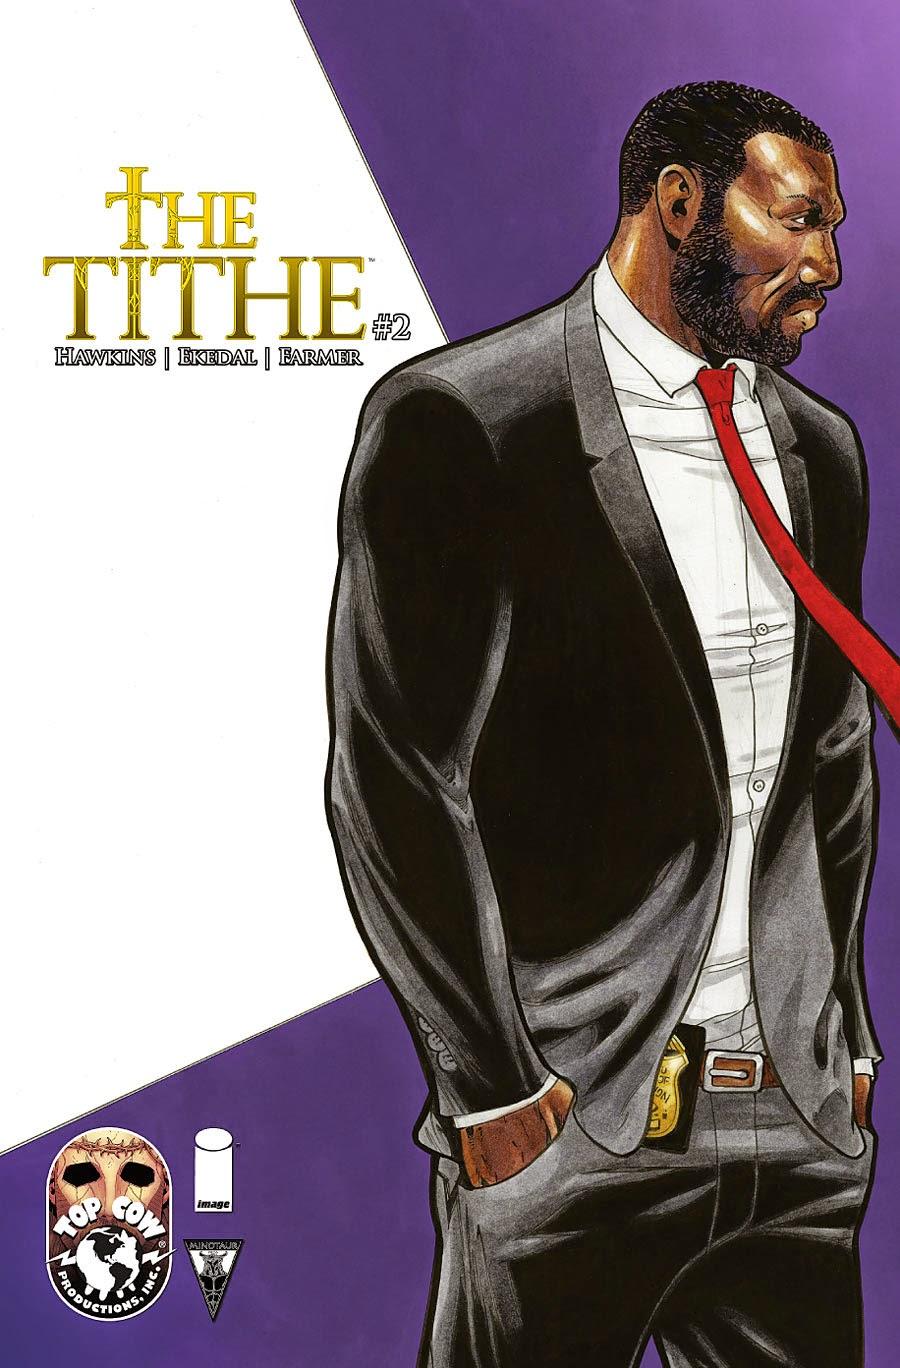 the tithe, comic book